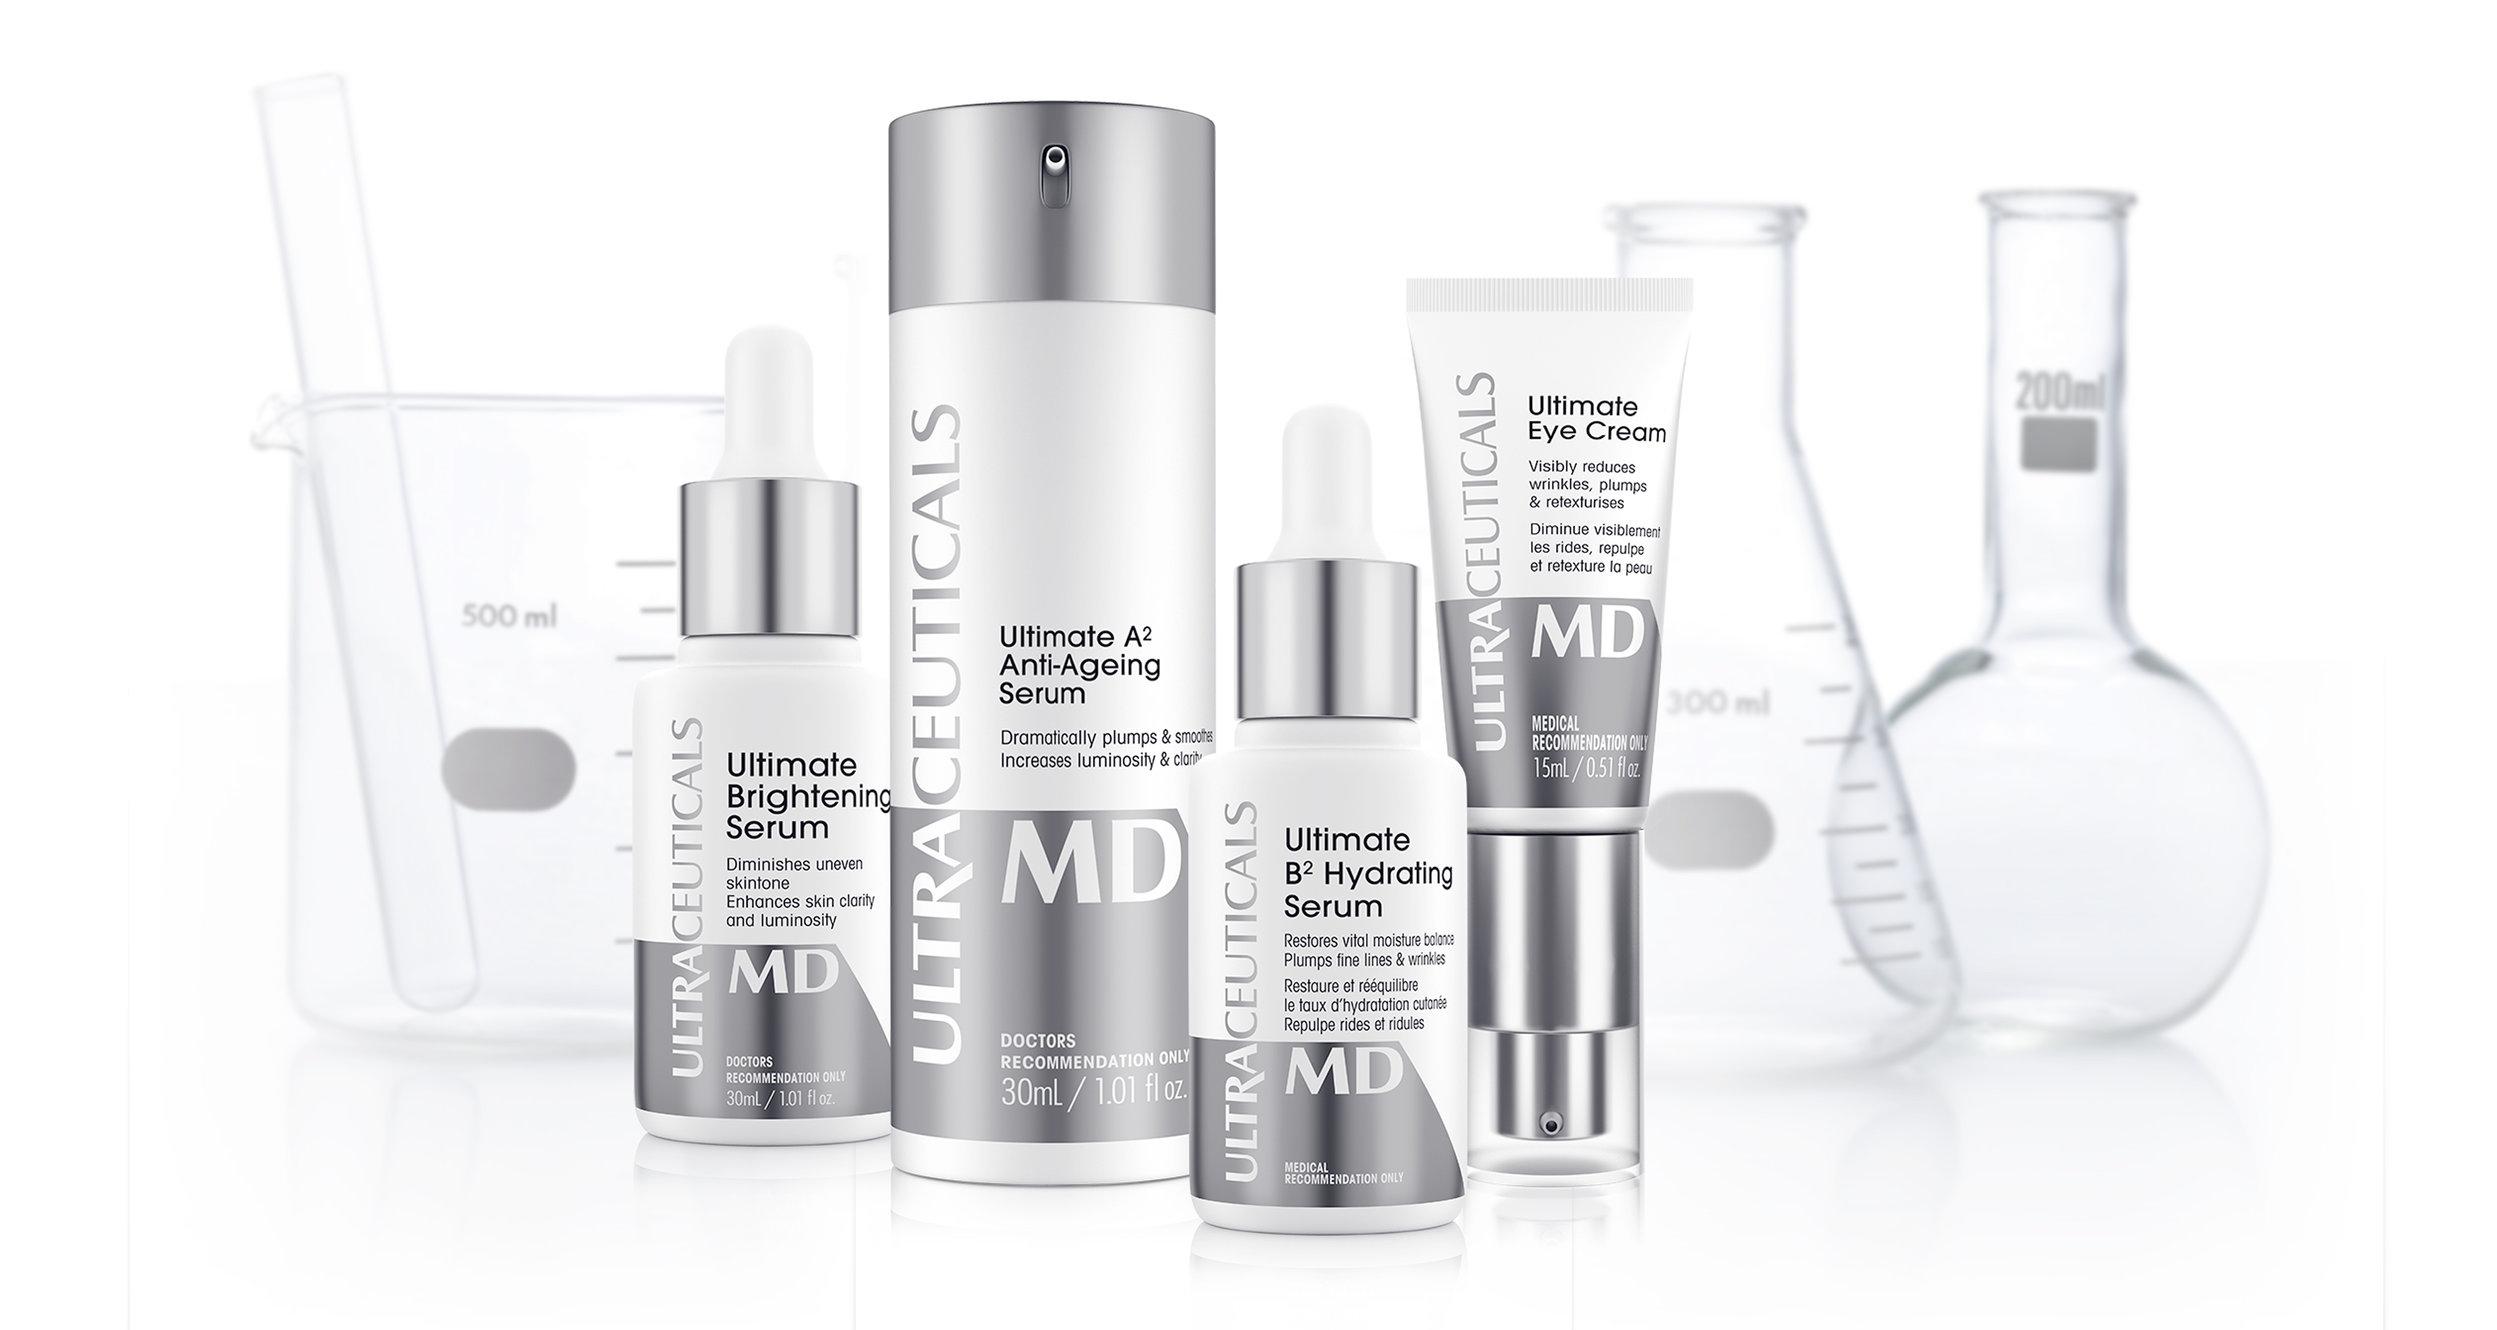 MD ultraceuticals medical grade skincare